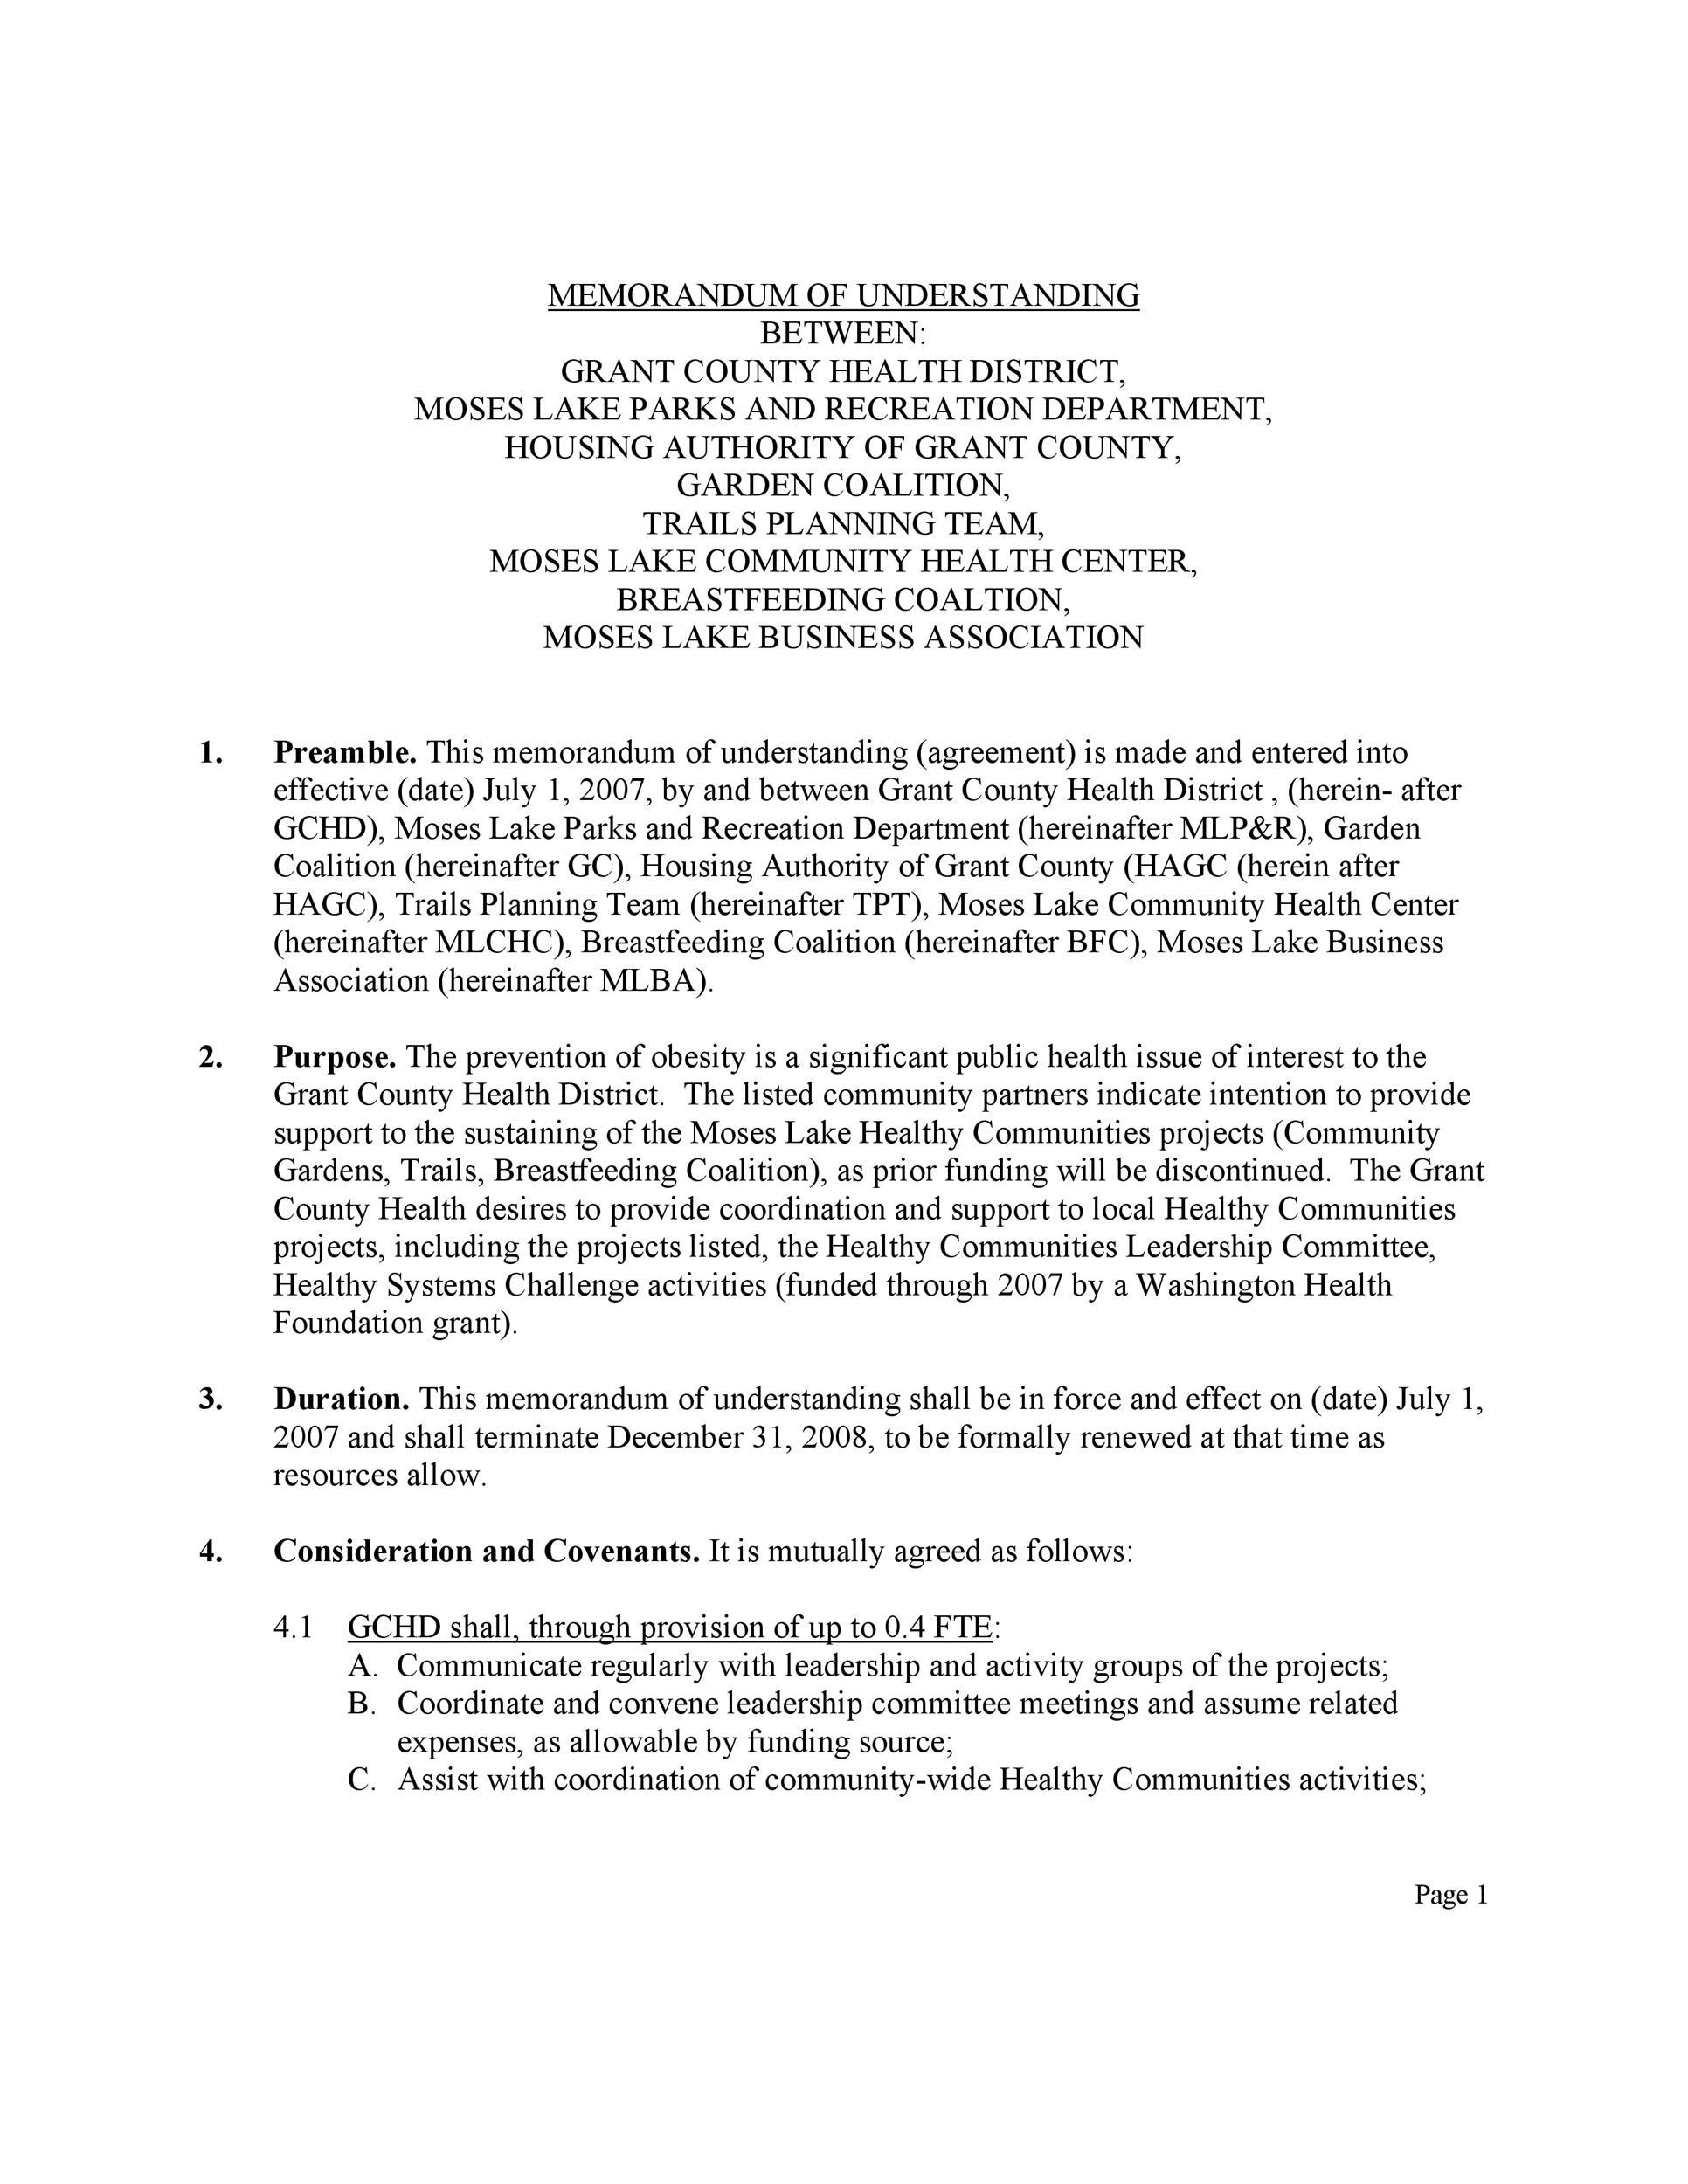 Free Memorandum of Understanding Template 12